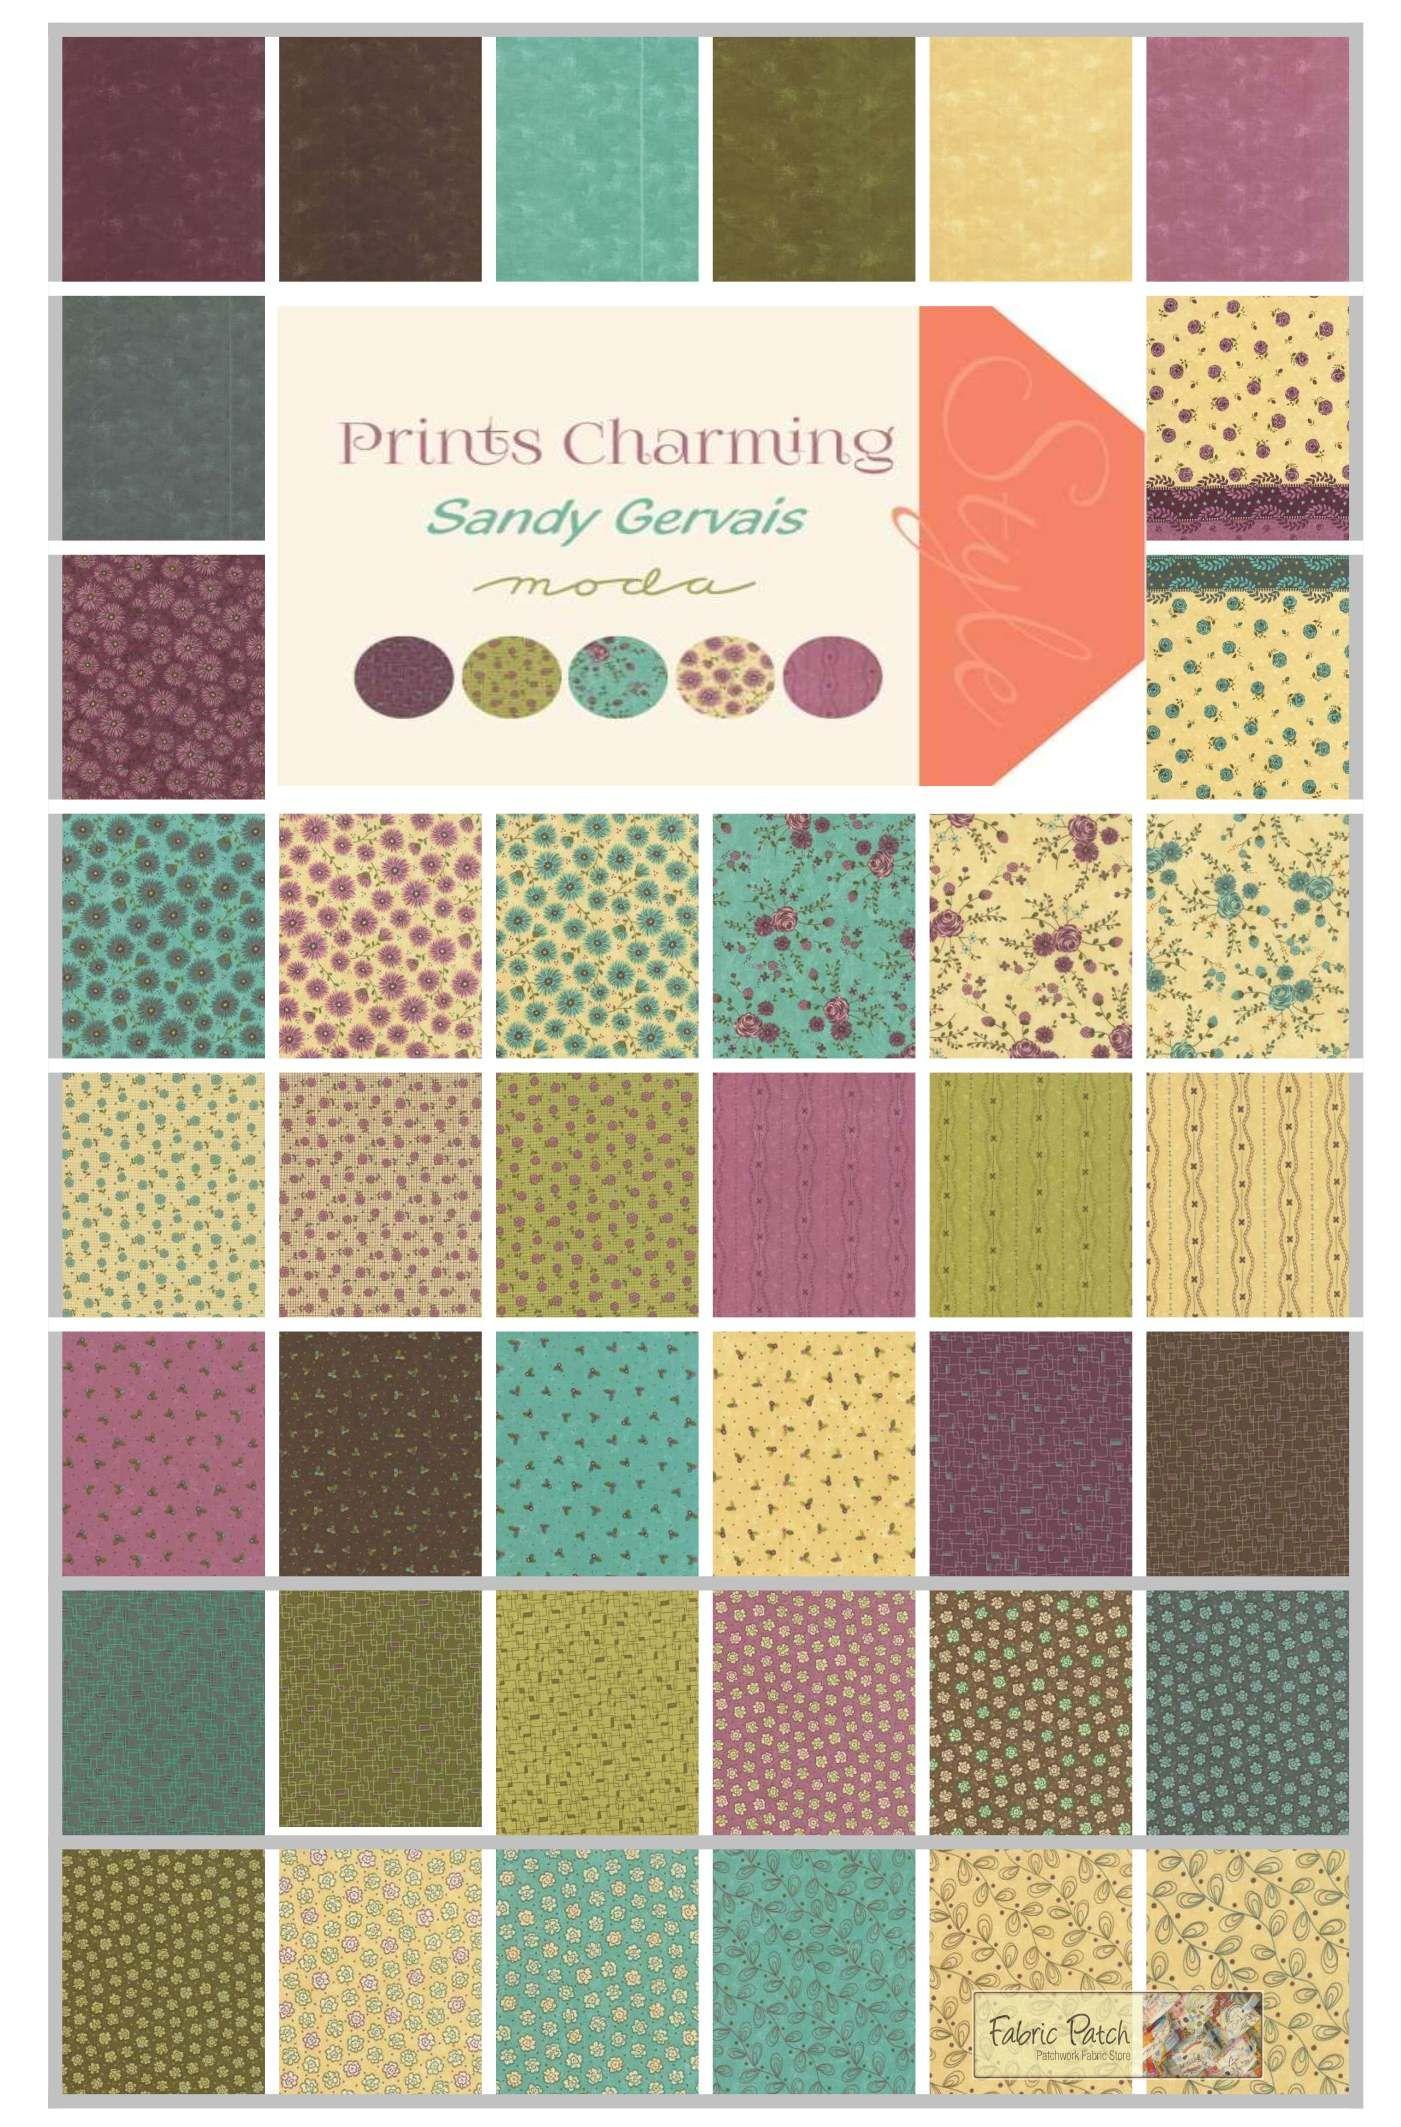 Prints Charming fat quarter bundle by Sandy Gervais for Moda ... : moda quilting fabric - Adamdwight.com